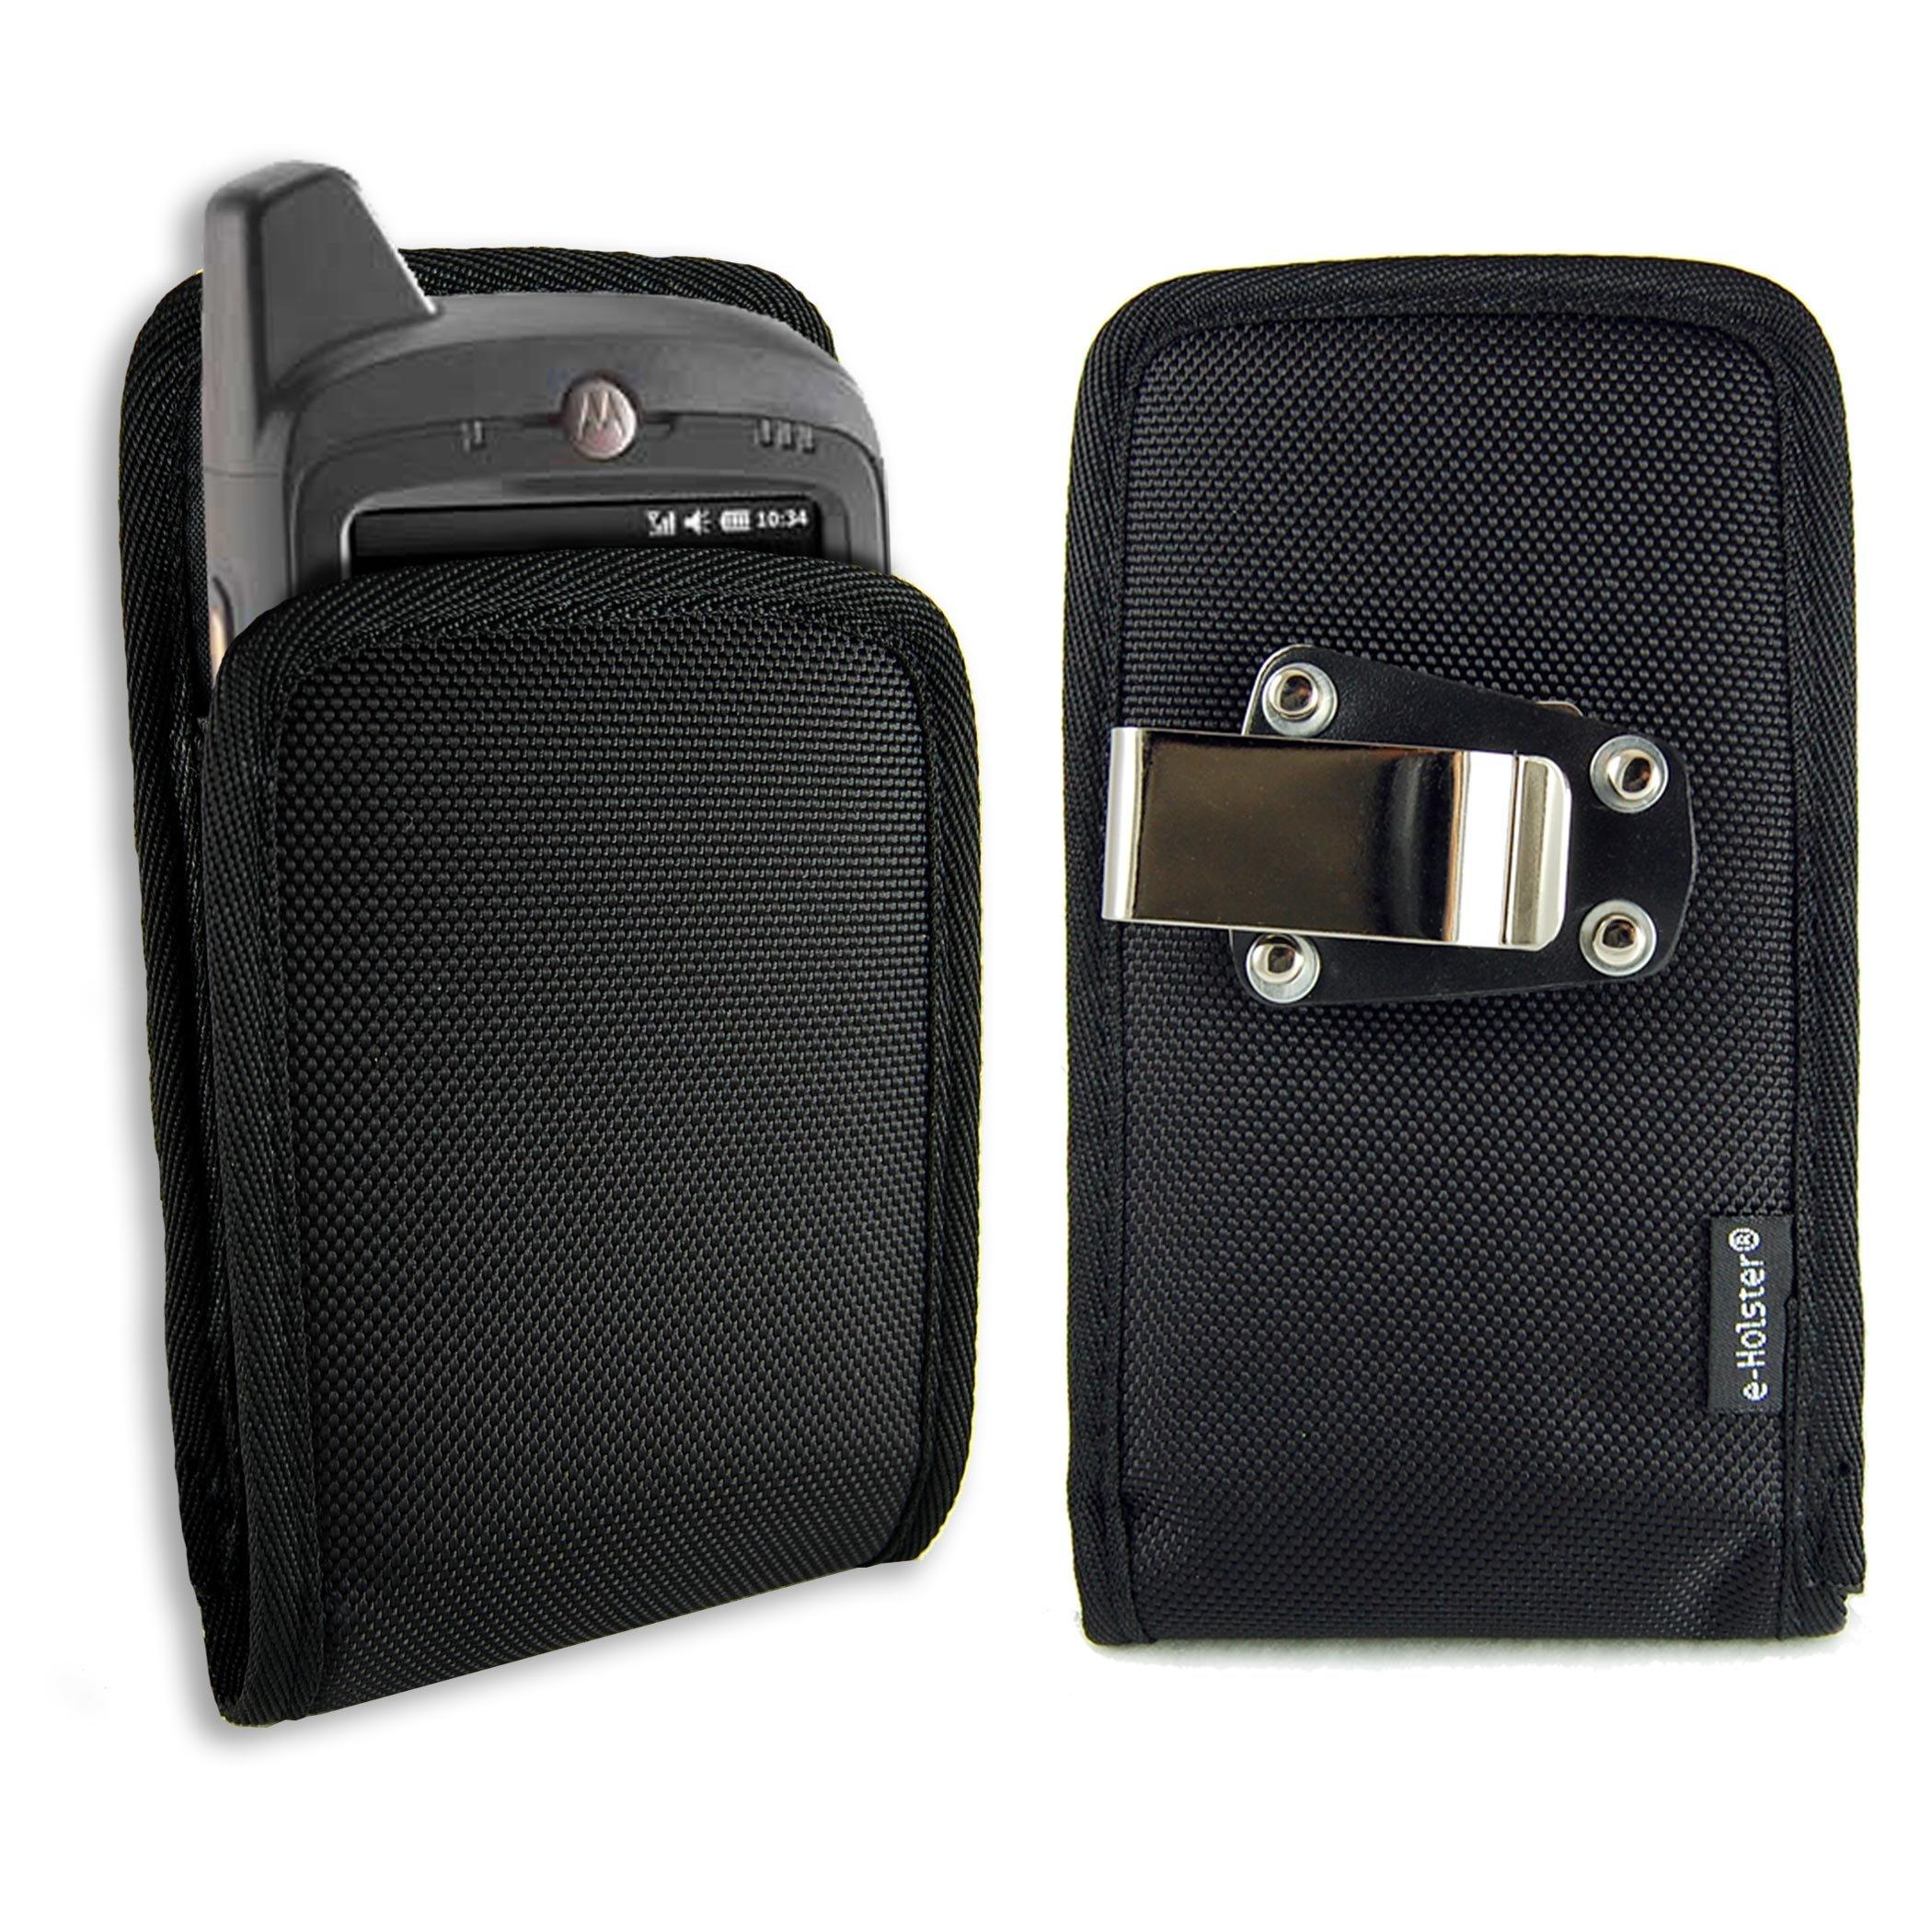 e-Holster Motorola MC65 Rugged Ballistic Nylon Case Holster with Rotating Belt Clip fits MC40, MC45, MC55, MC67, MC70 & MC75